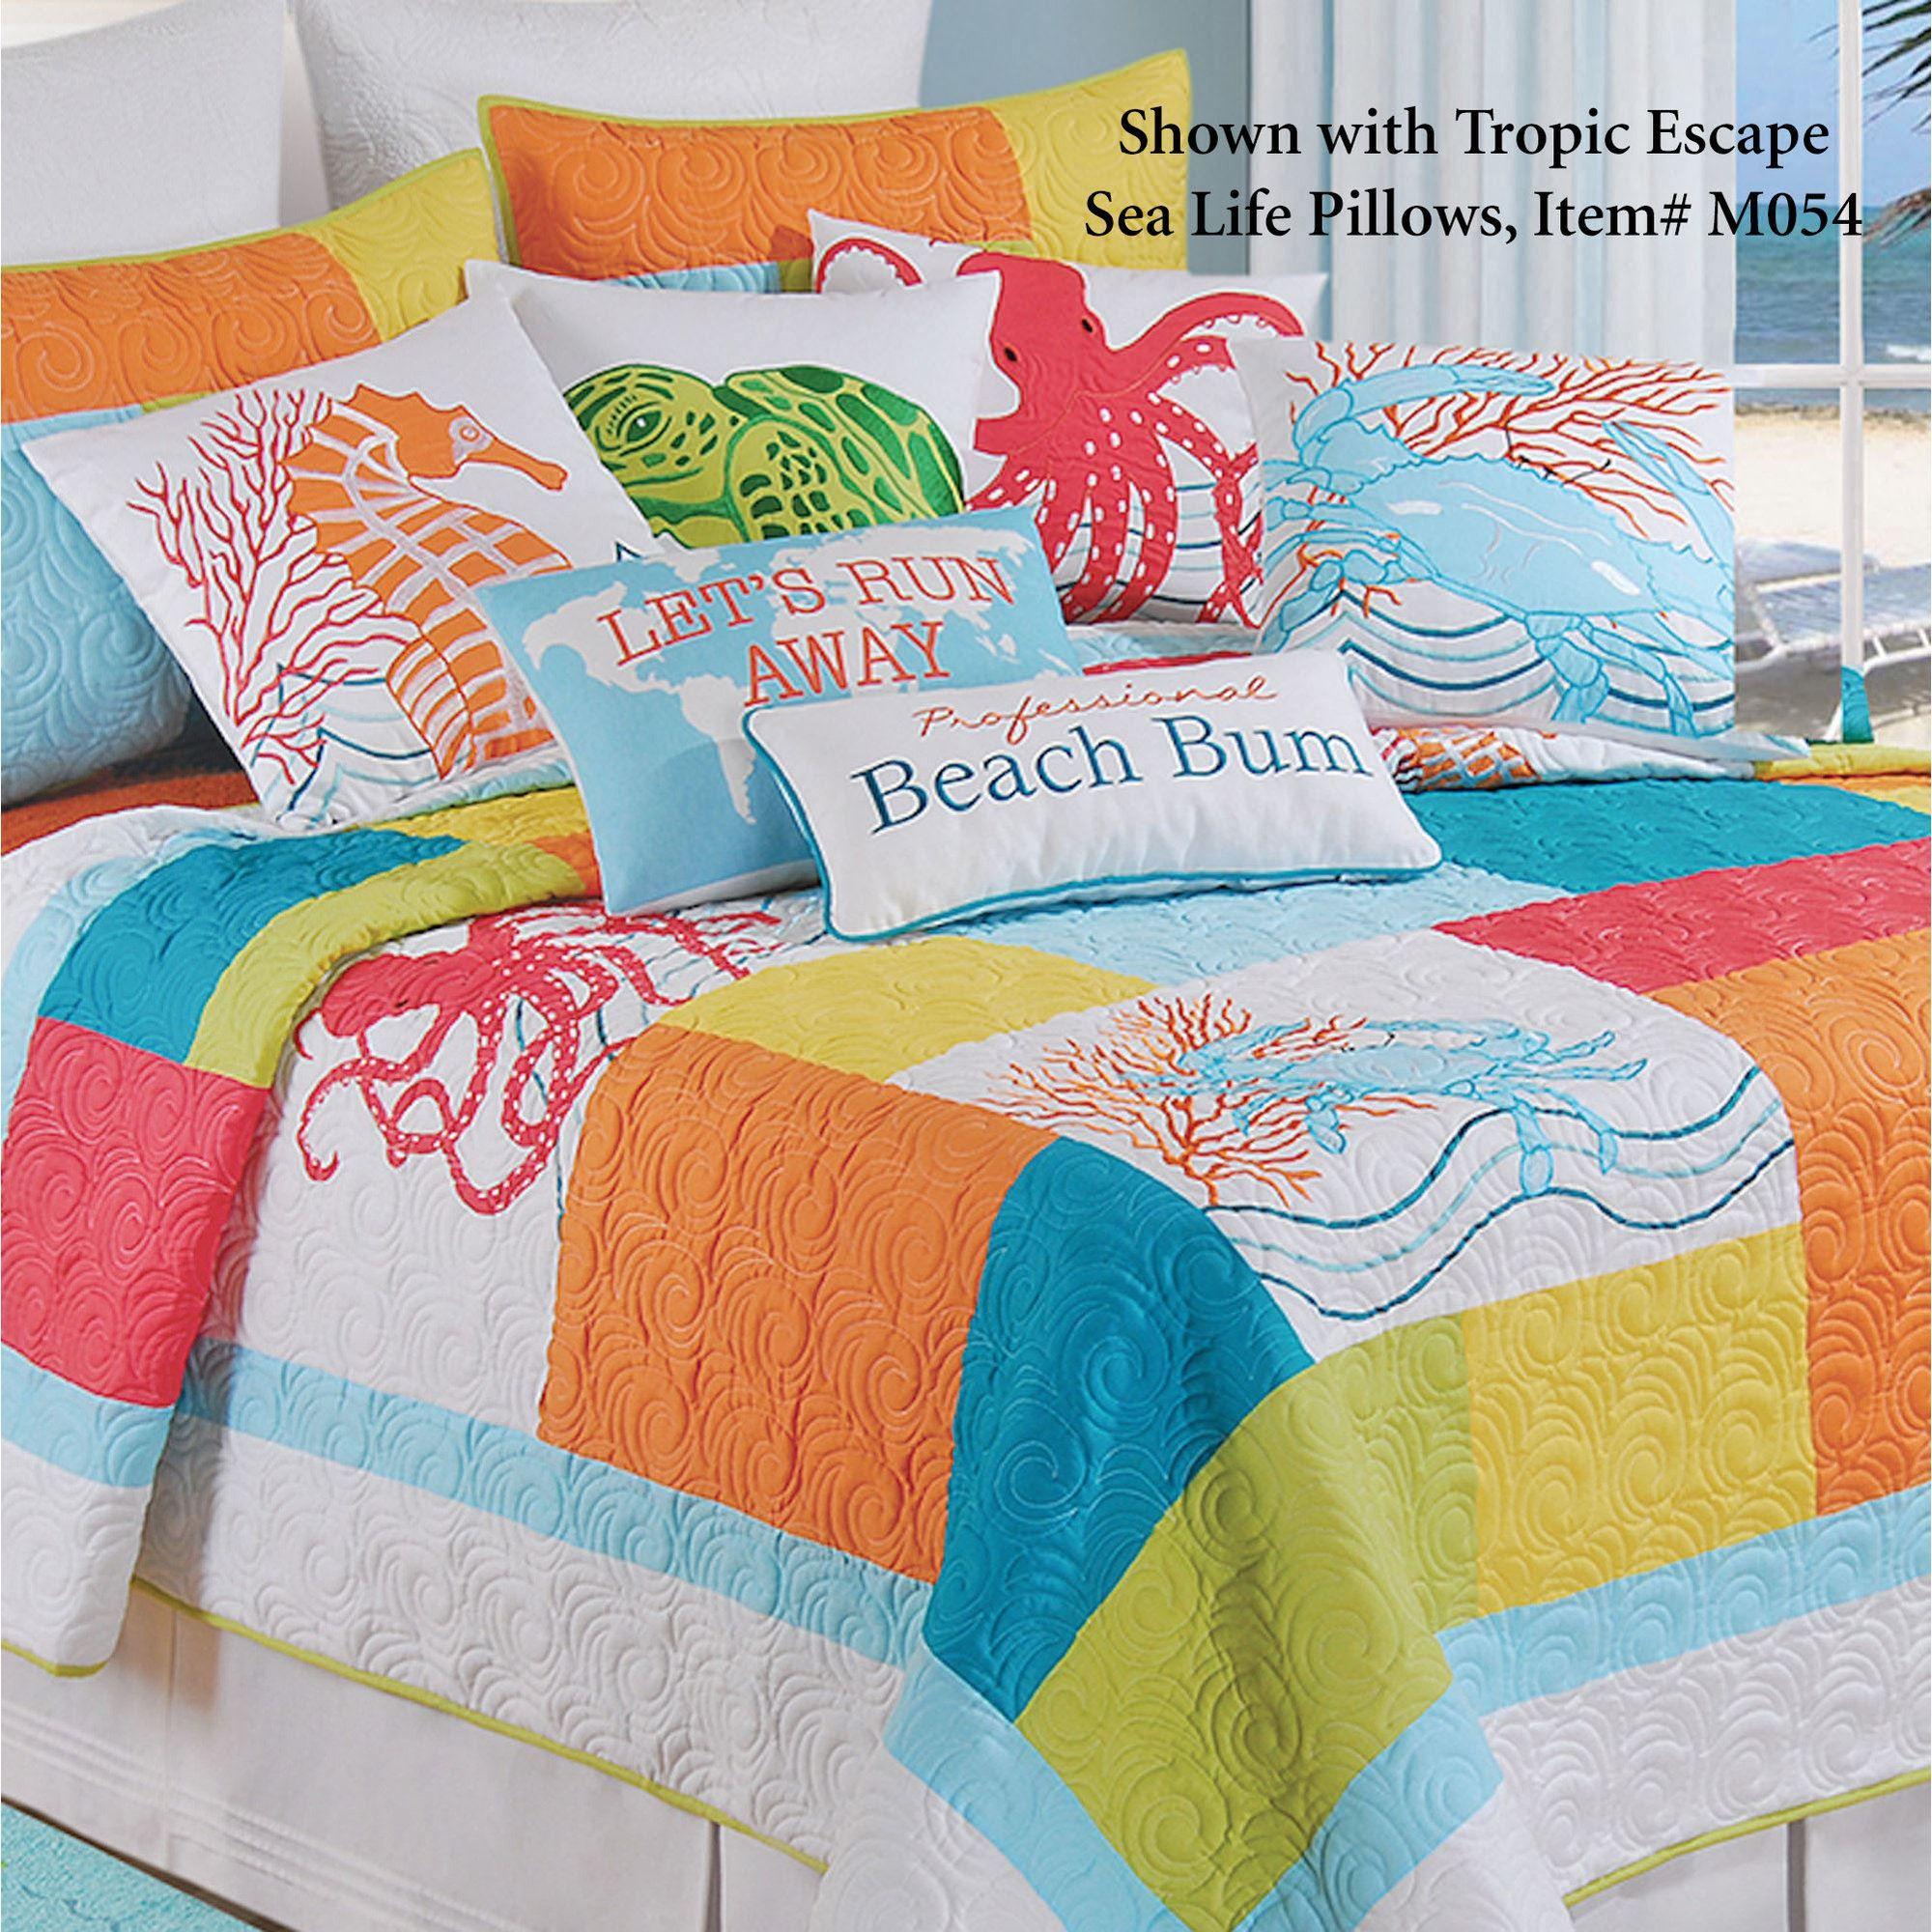 home design themed comforters bed queen collection house print duvet bedding cottage set coastal bedroom seaside sets decor beach king coral comforter